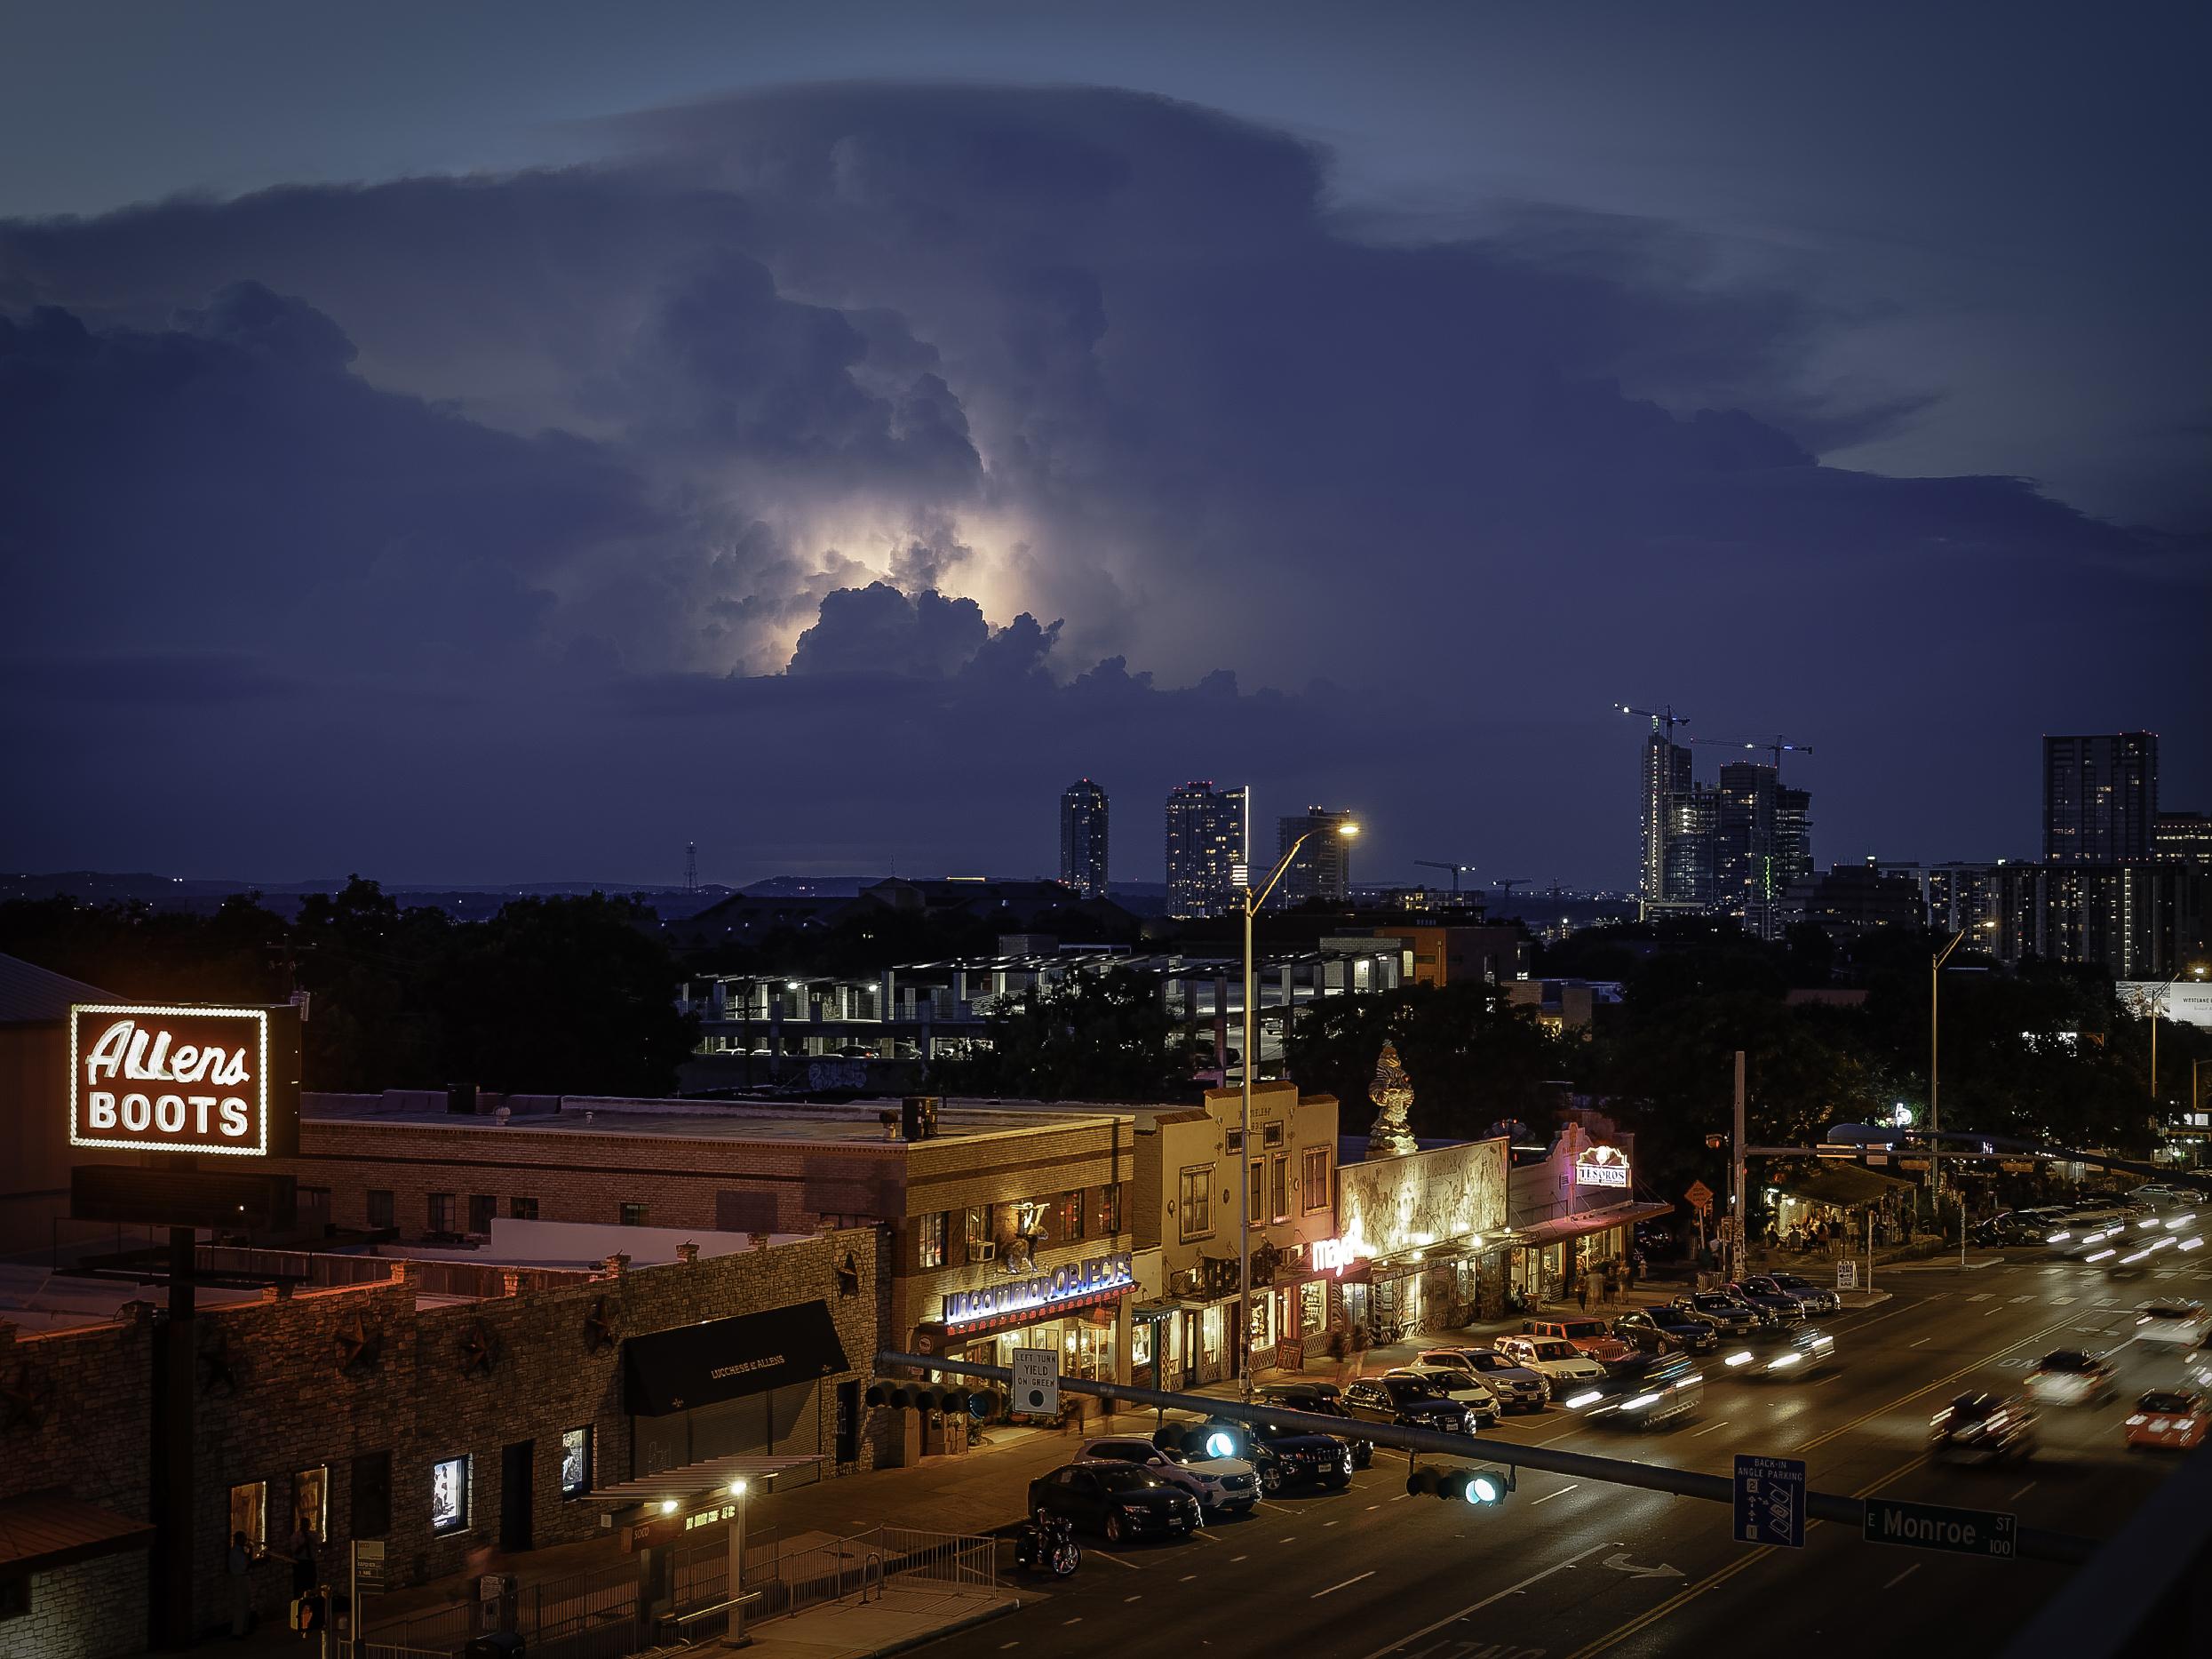 South River City, Austin, Tx, Usa Sunrise Sunset Times Regarding Sunrise Sunset Times Austin Texas